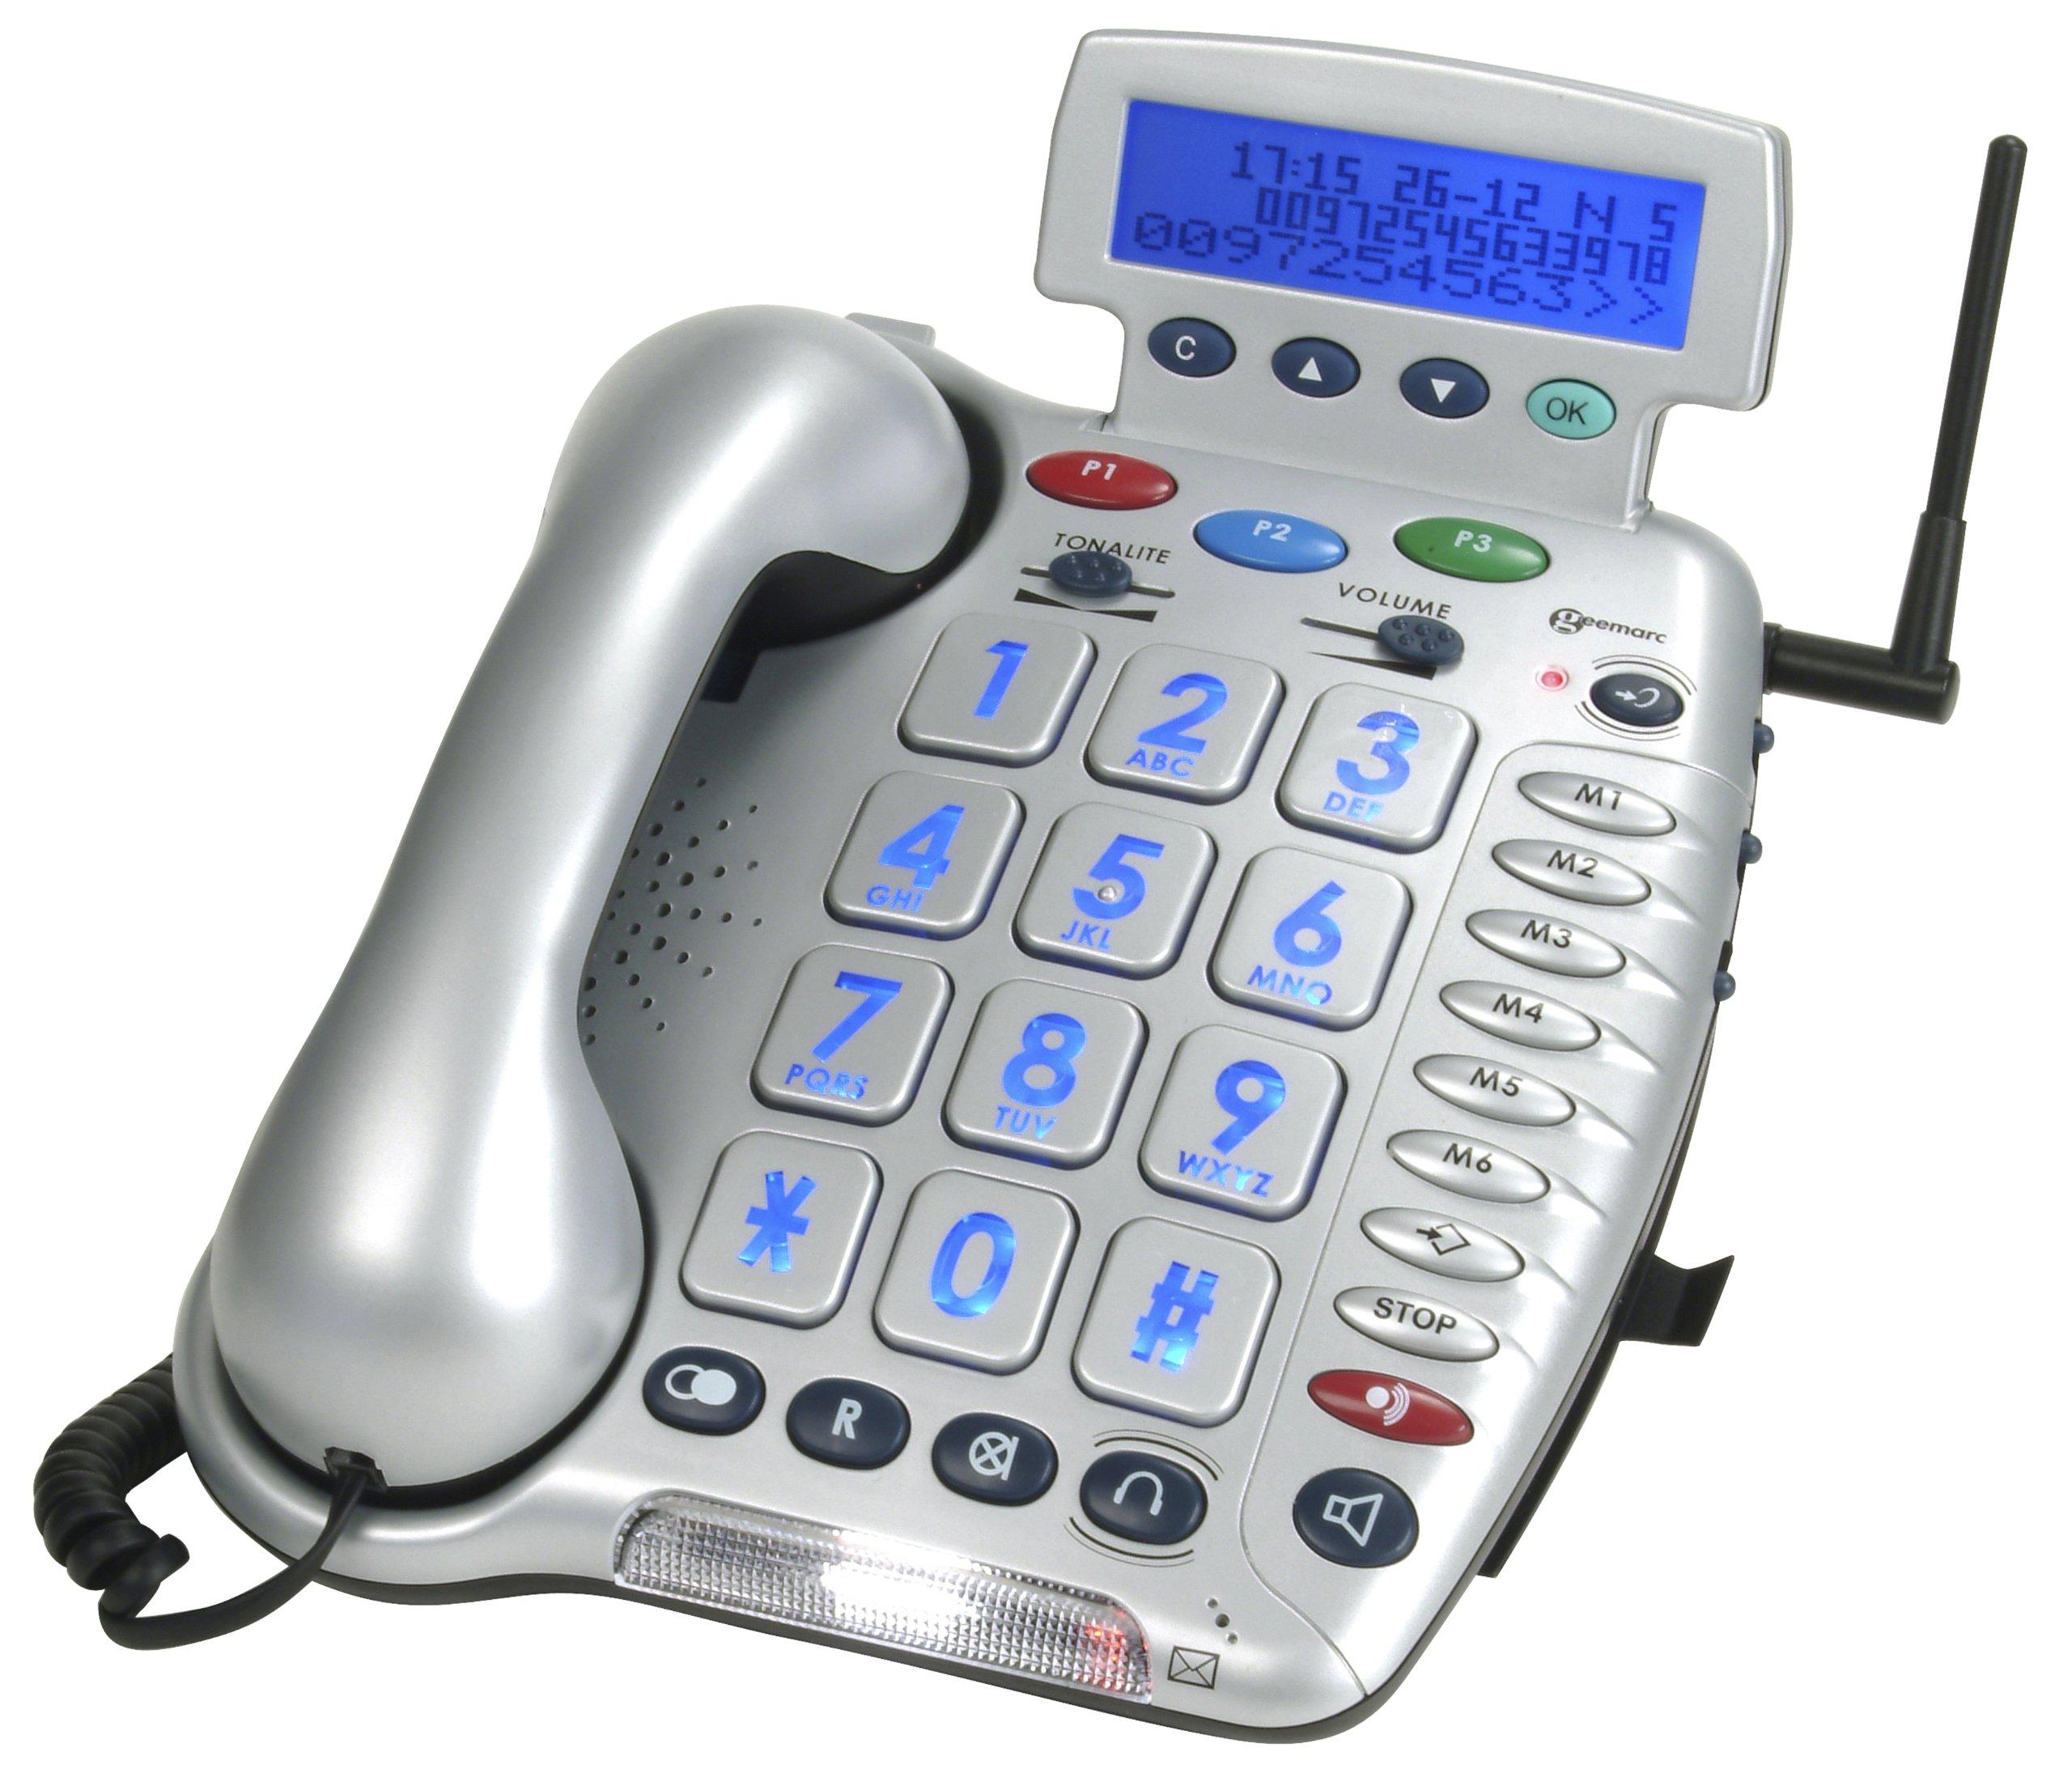 Geemarc - Emergency Response Telephone 40db